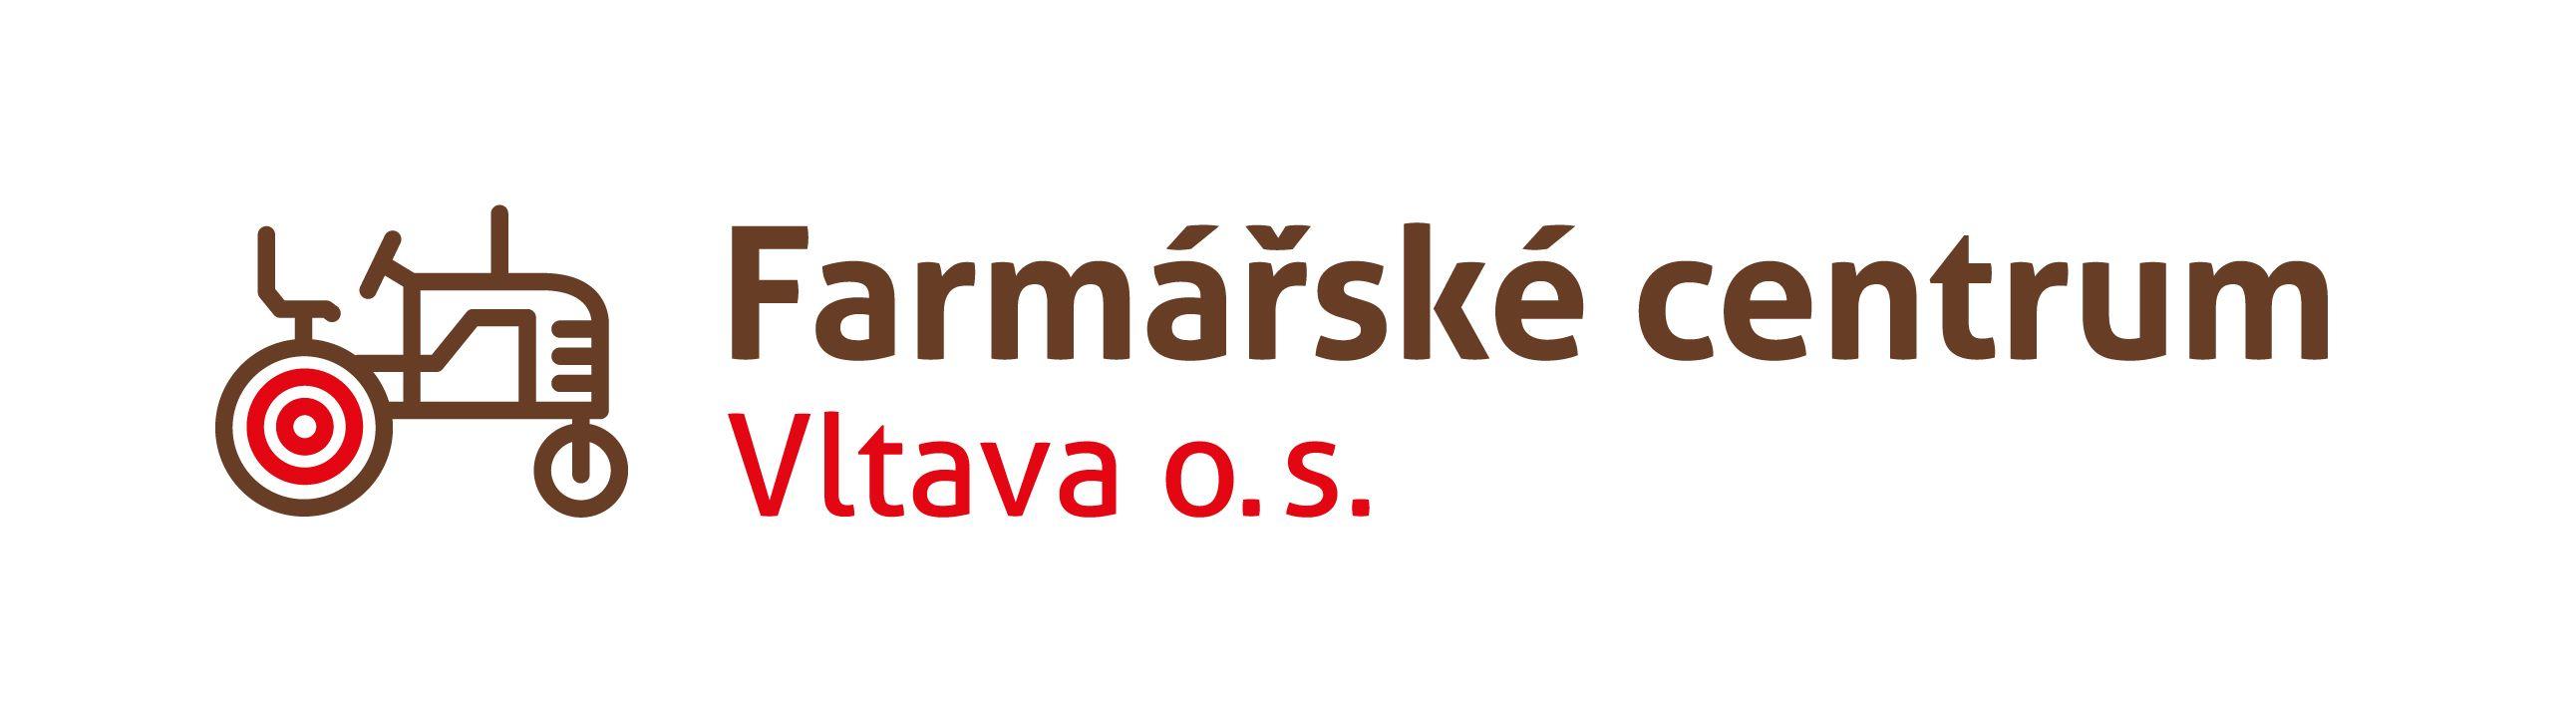 Webové stránky členů MAS Vltava